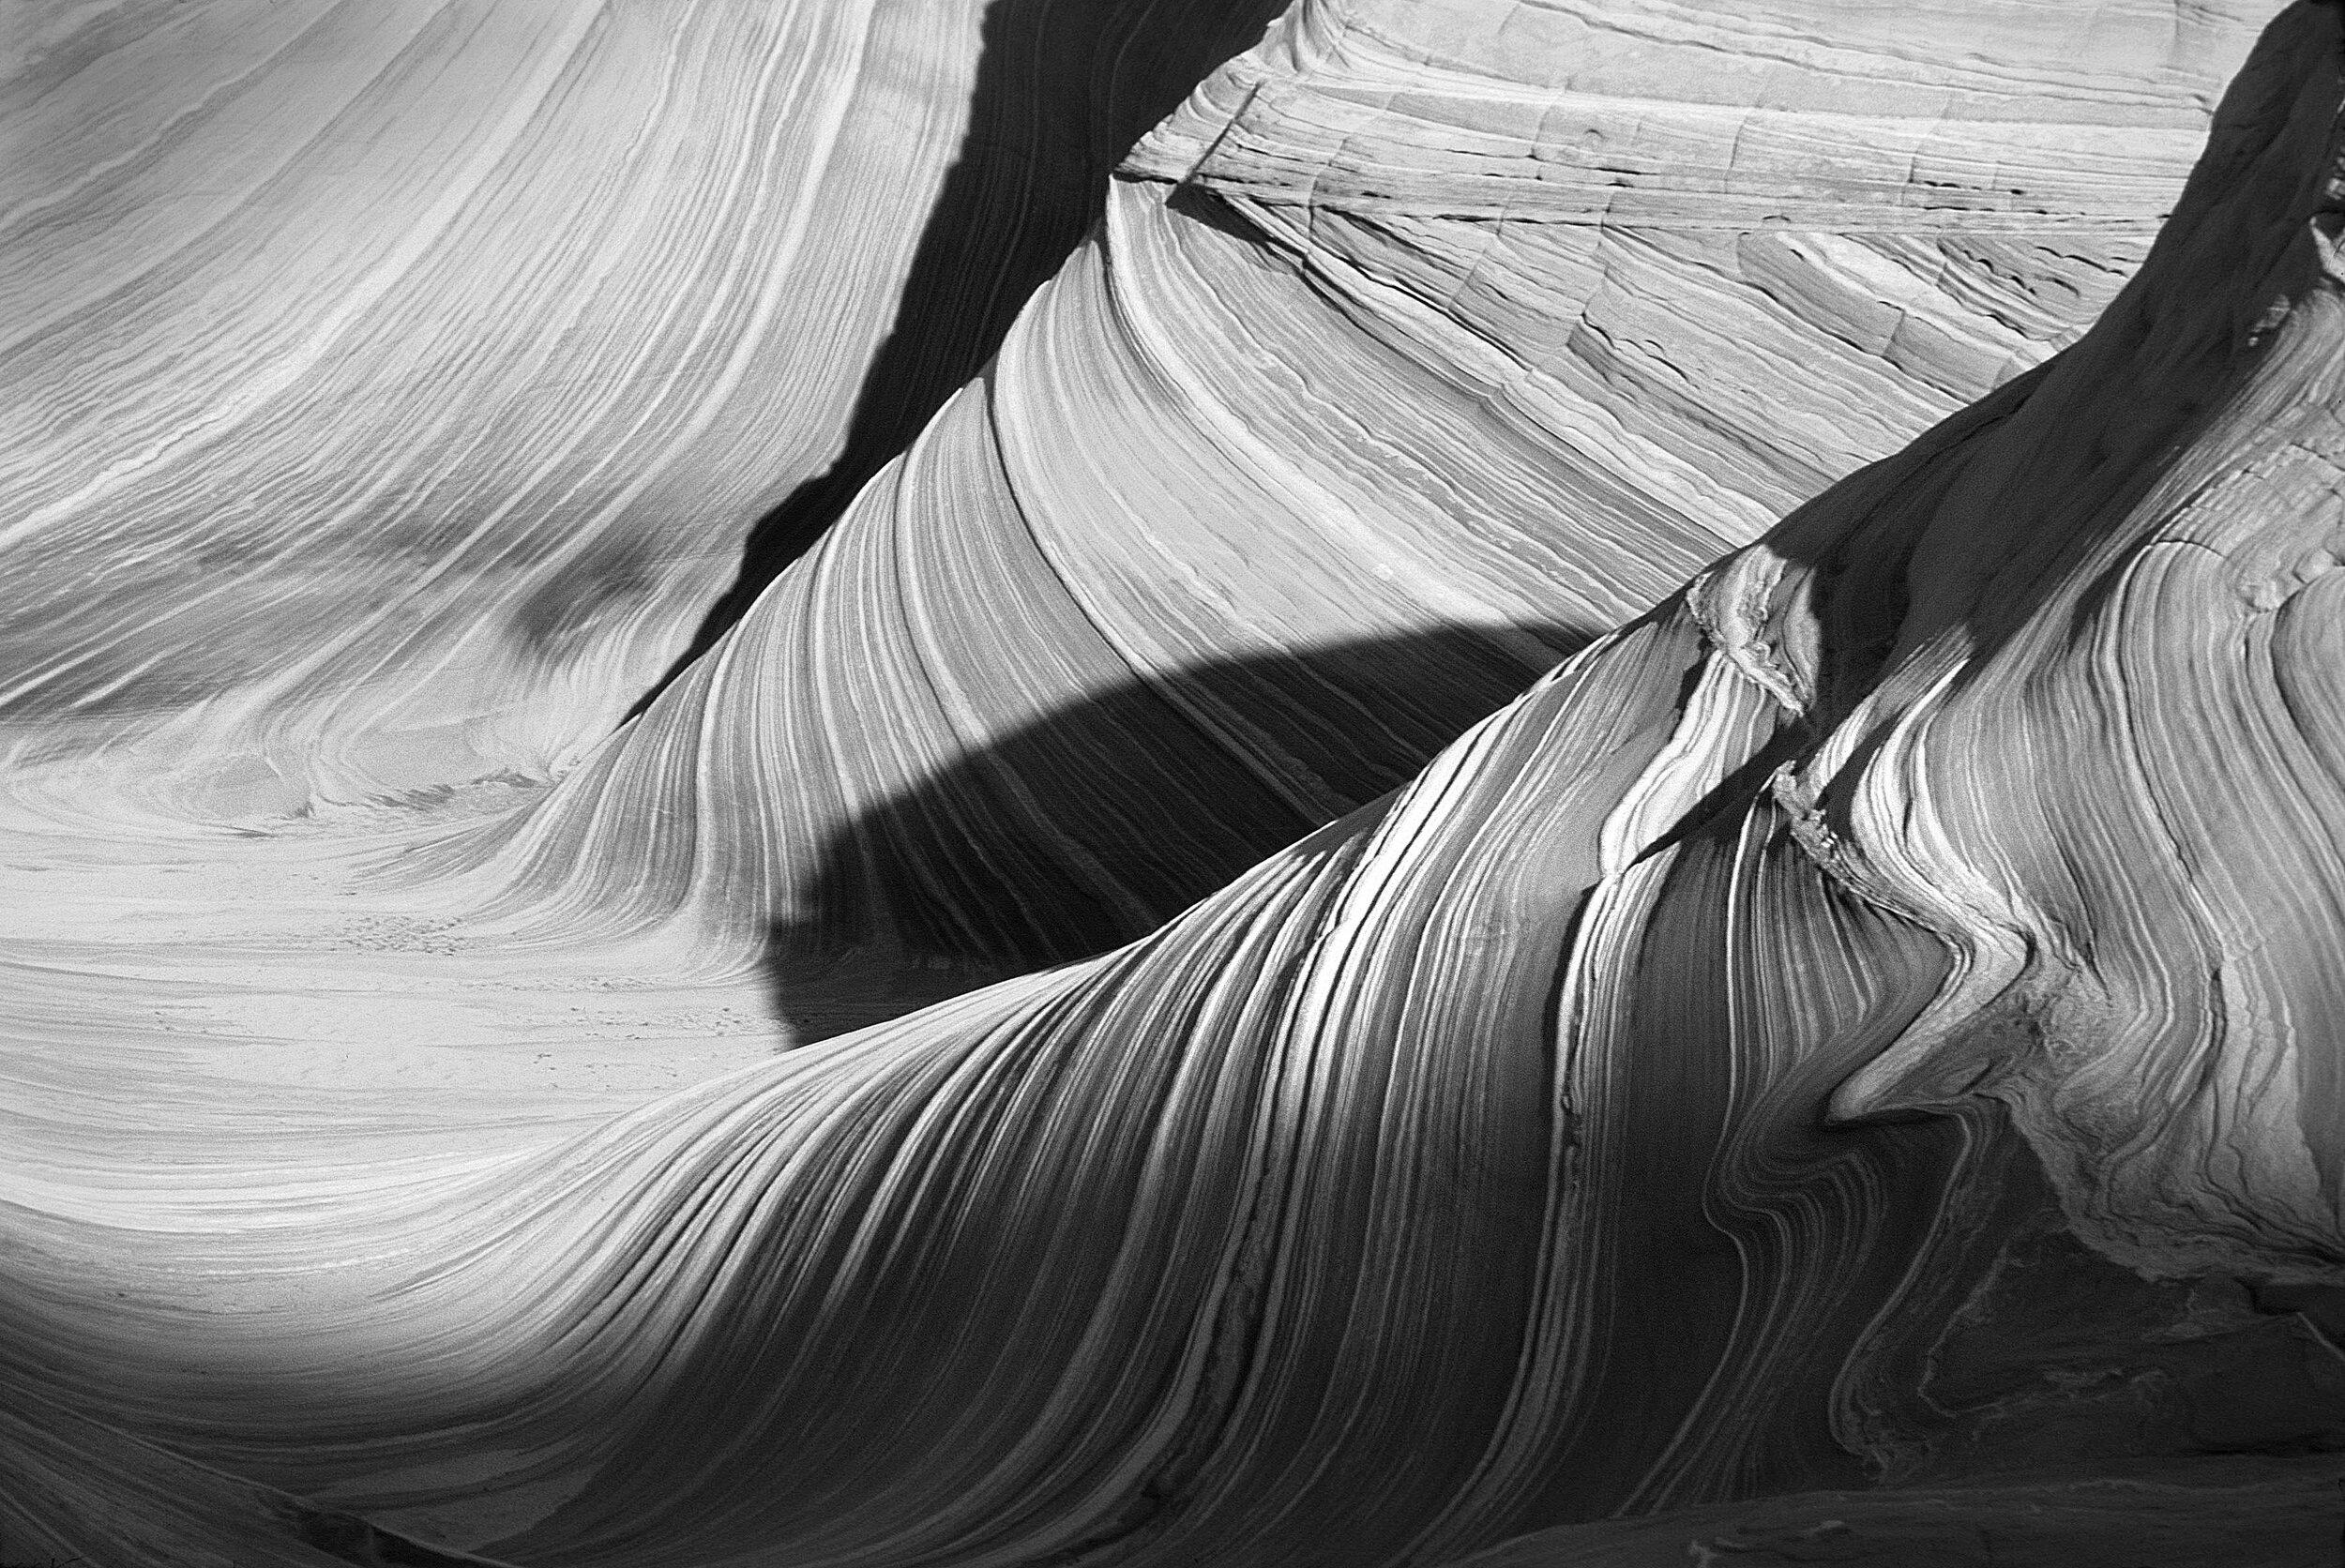 3082627-black-and-white_canyon_curve_desert_landscape_pattern_sandstone.jpg